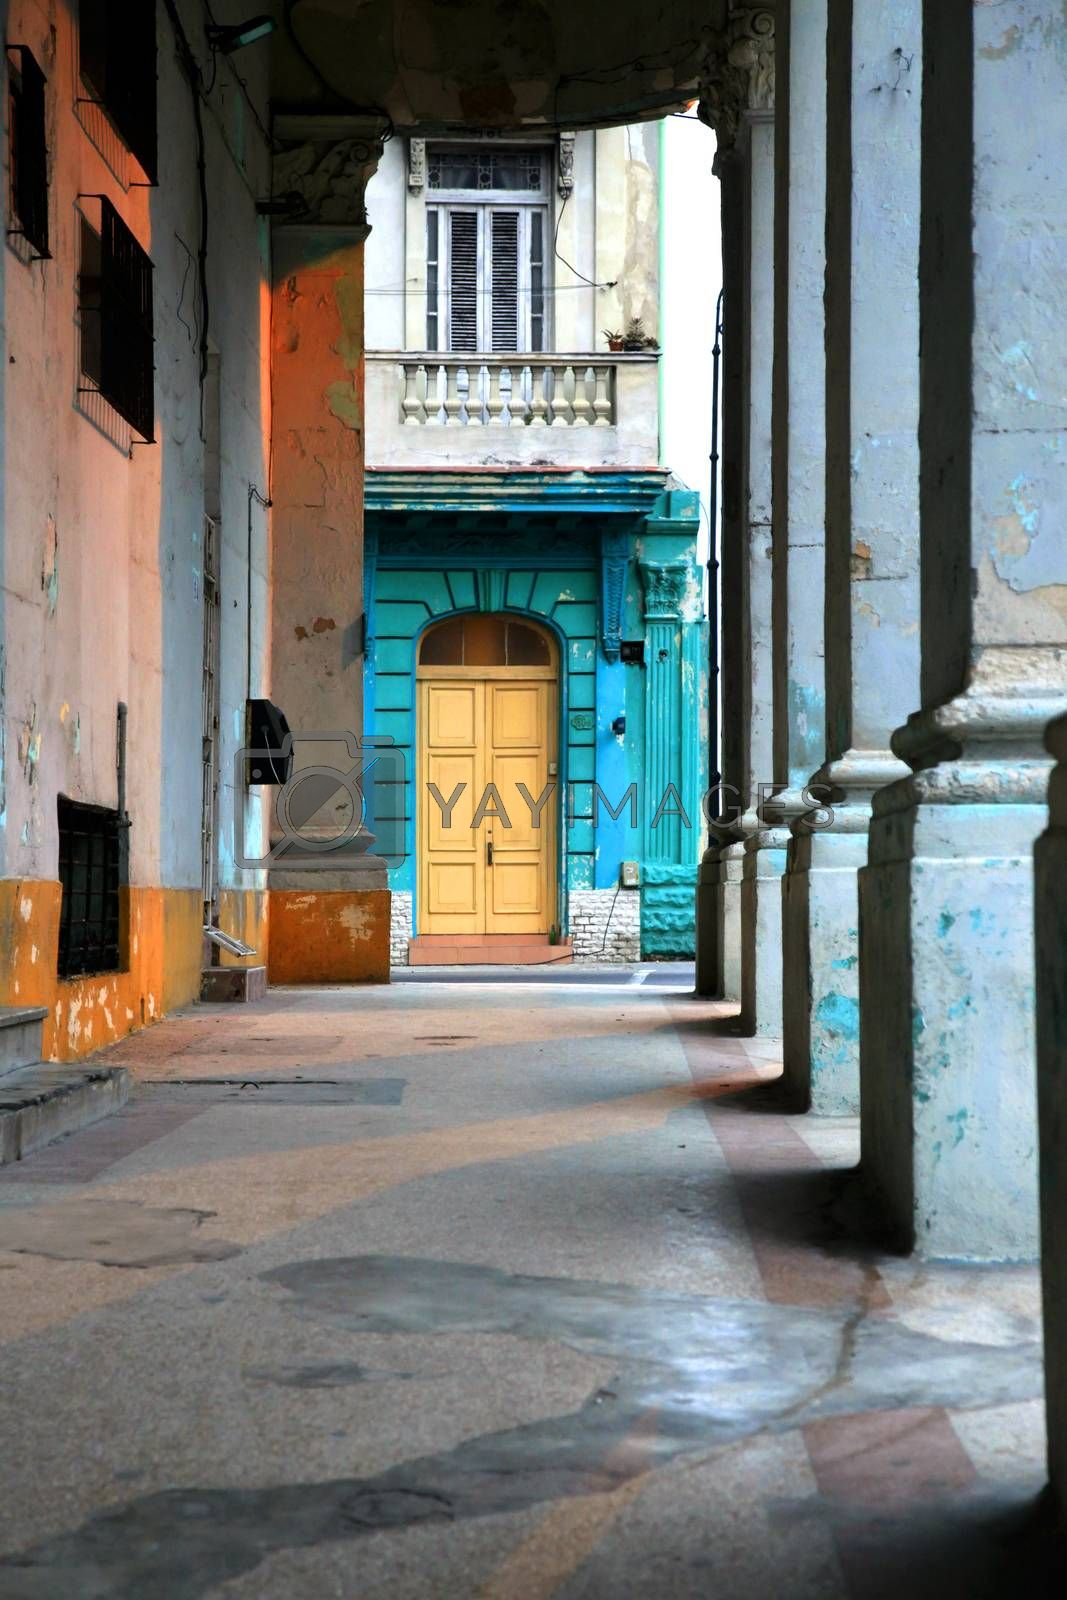 Typical portico under a colonial building in Old Havana, Cuba